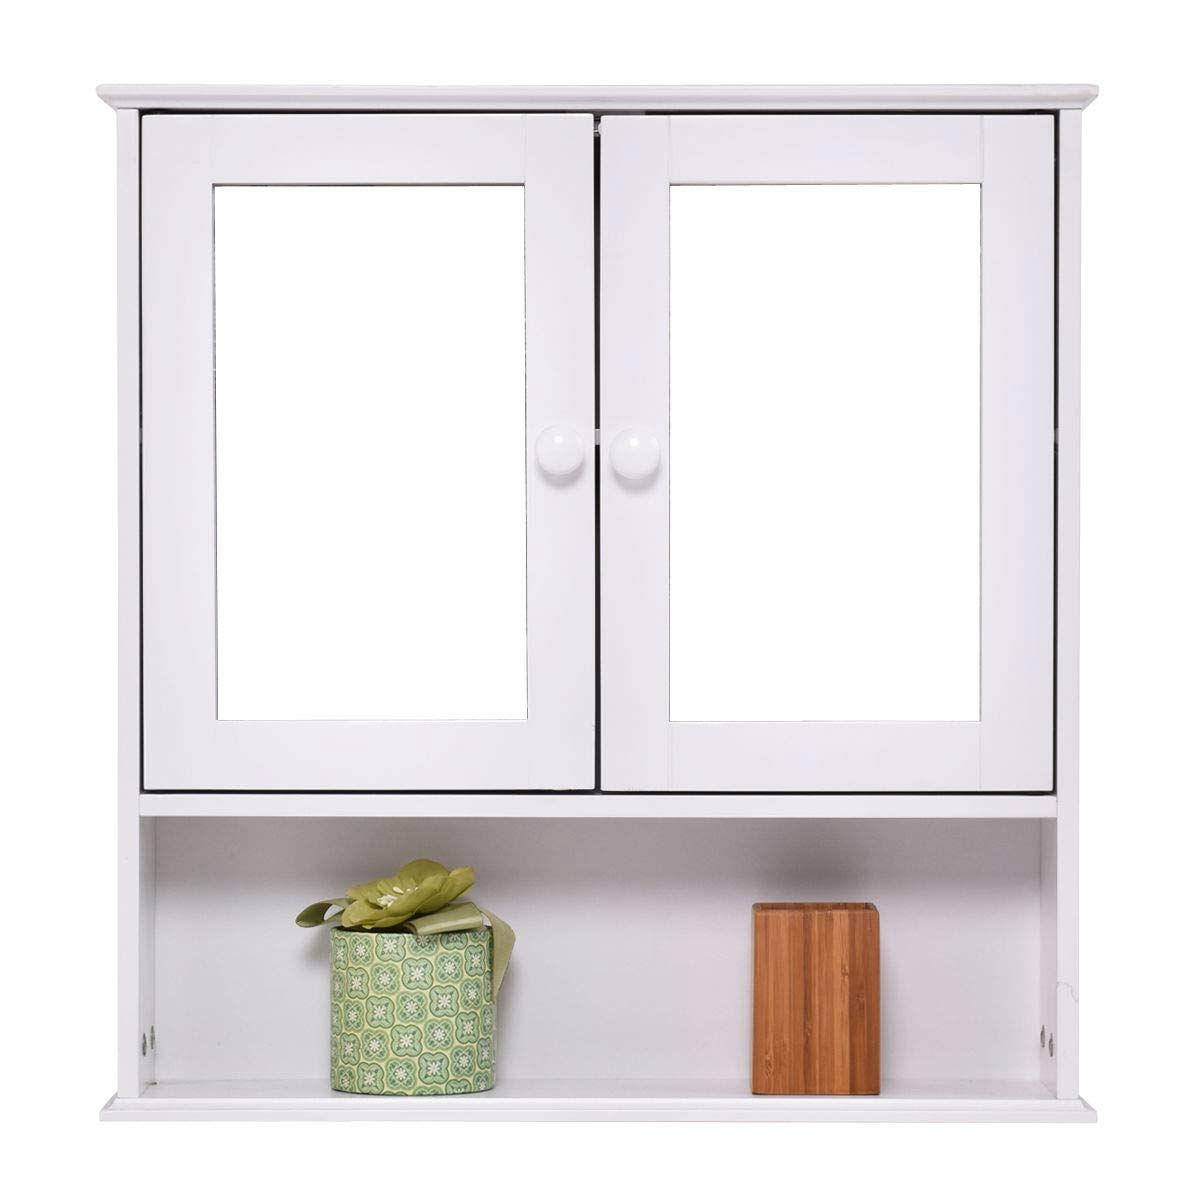 Simple Bathroom Mirror Wall Cabinet In